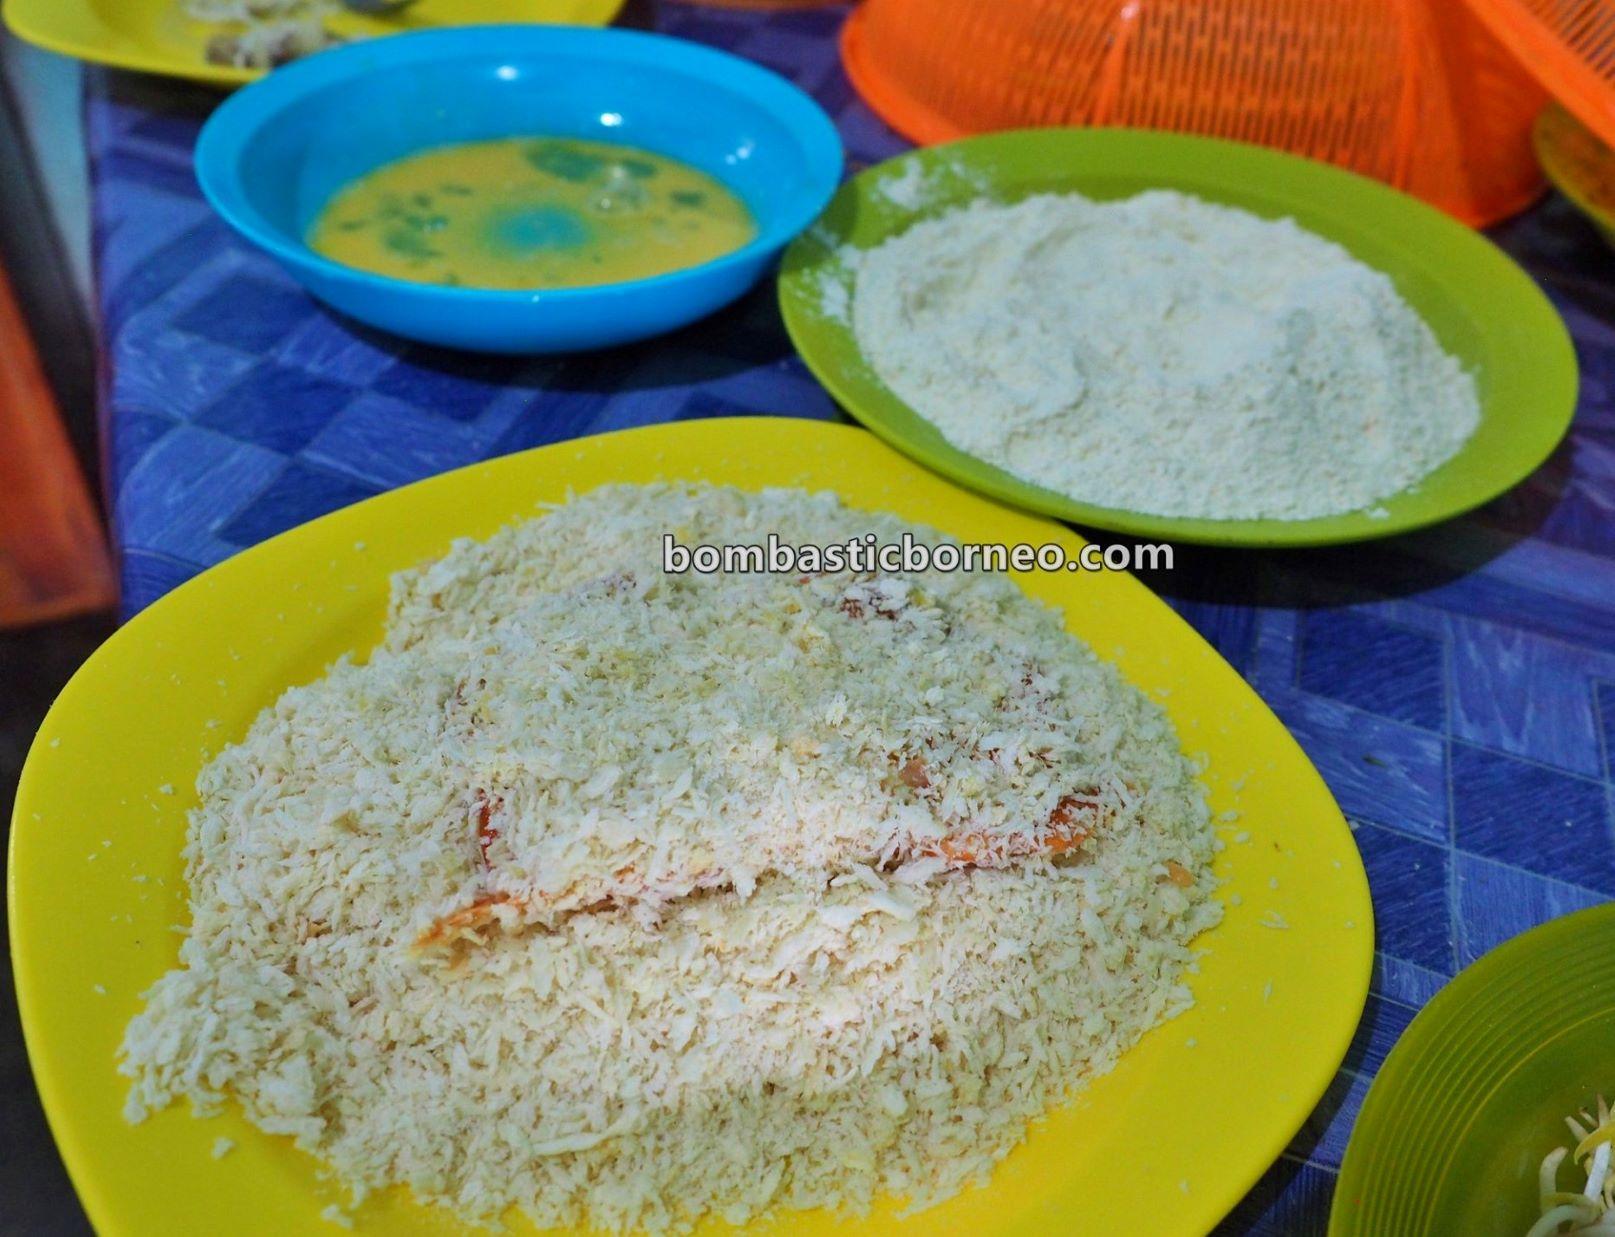 Kepiting Soka, Soft Shell Crab Farm, destination, Exotic Delicacy, seafood, Kalimantan Utara, Kaltara, Pariwisata, tourist attraction, Borneo,